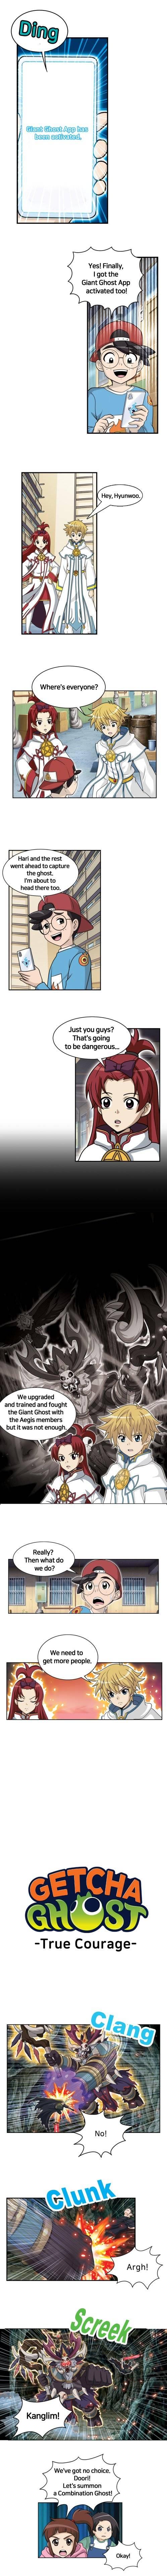 GETCHA GHOST: Featured - Webtoon -6 image 3